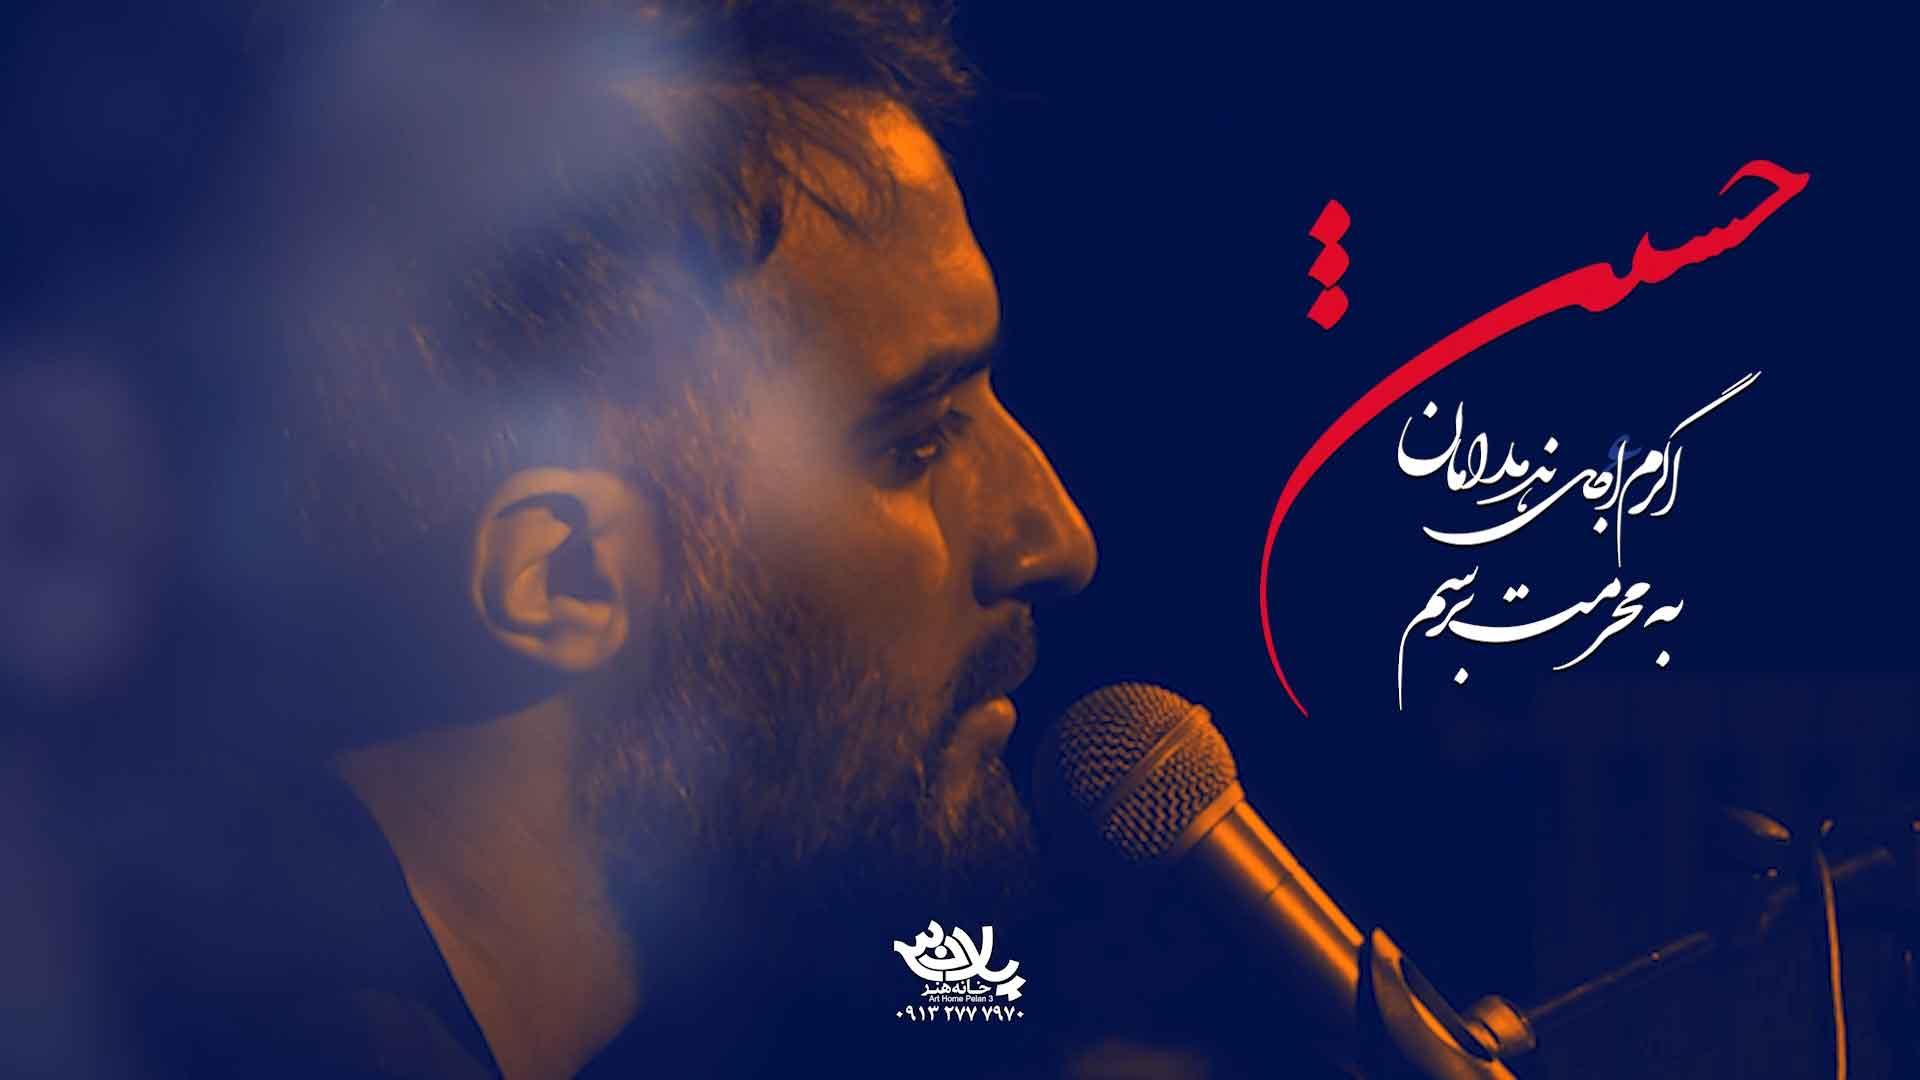 اگرم اجل ندهد امان محمدحسین پویانفر